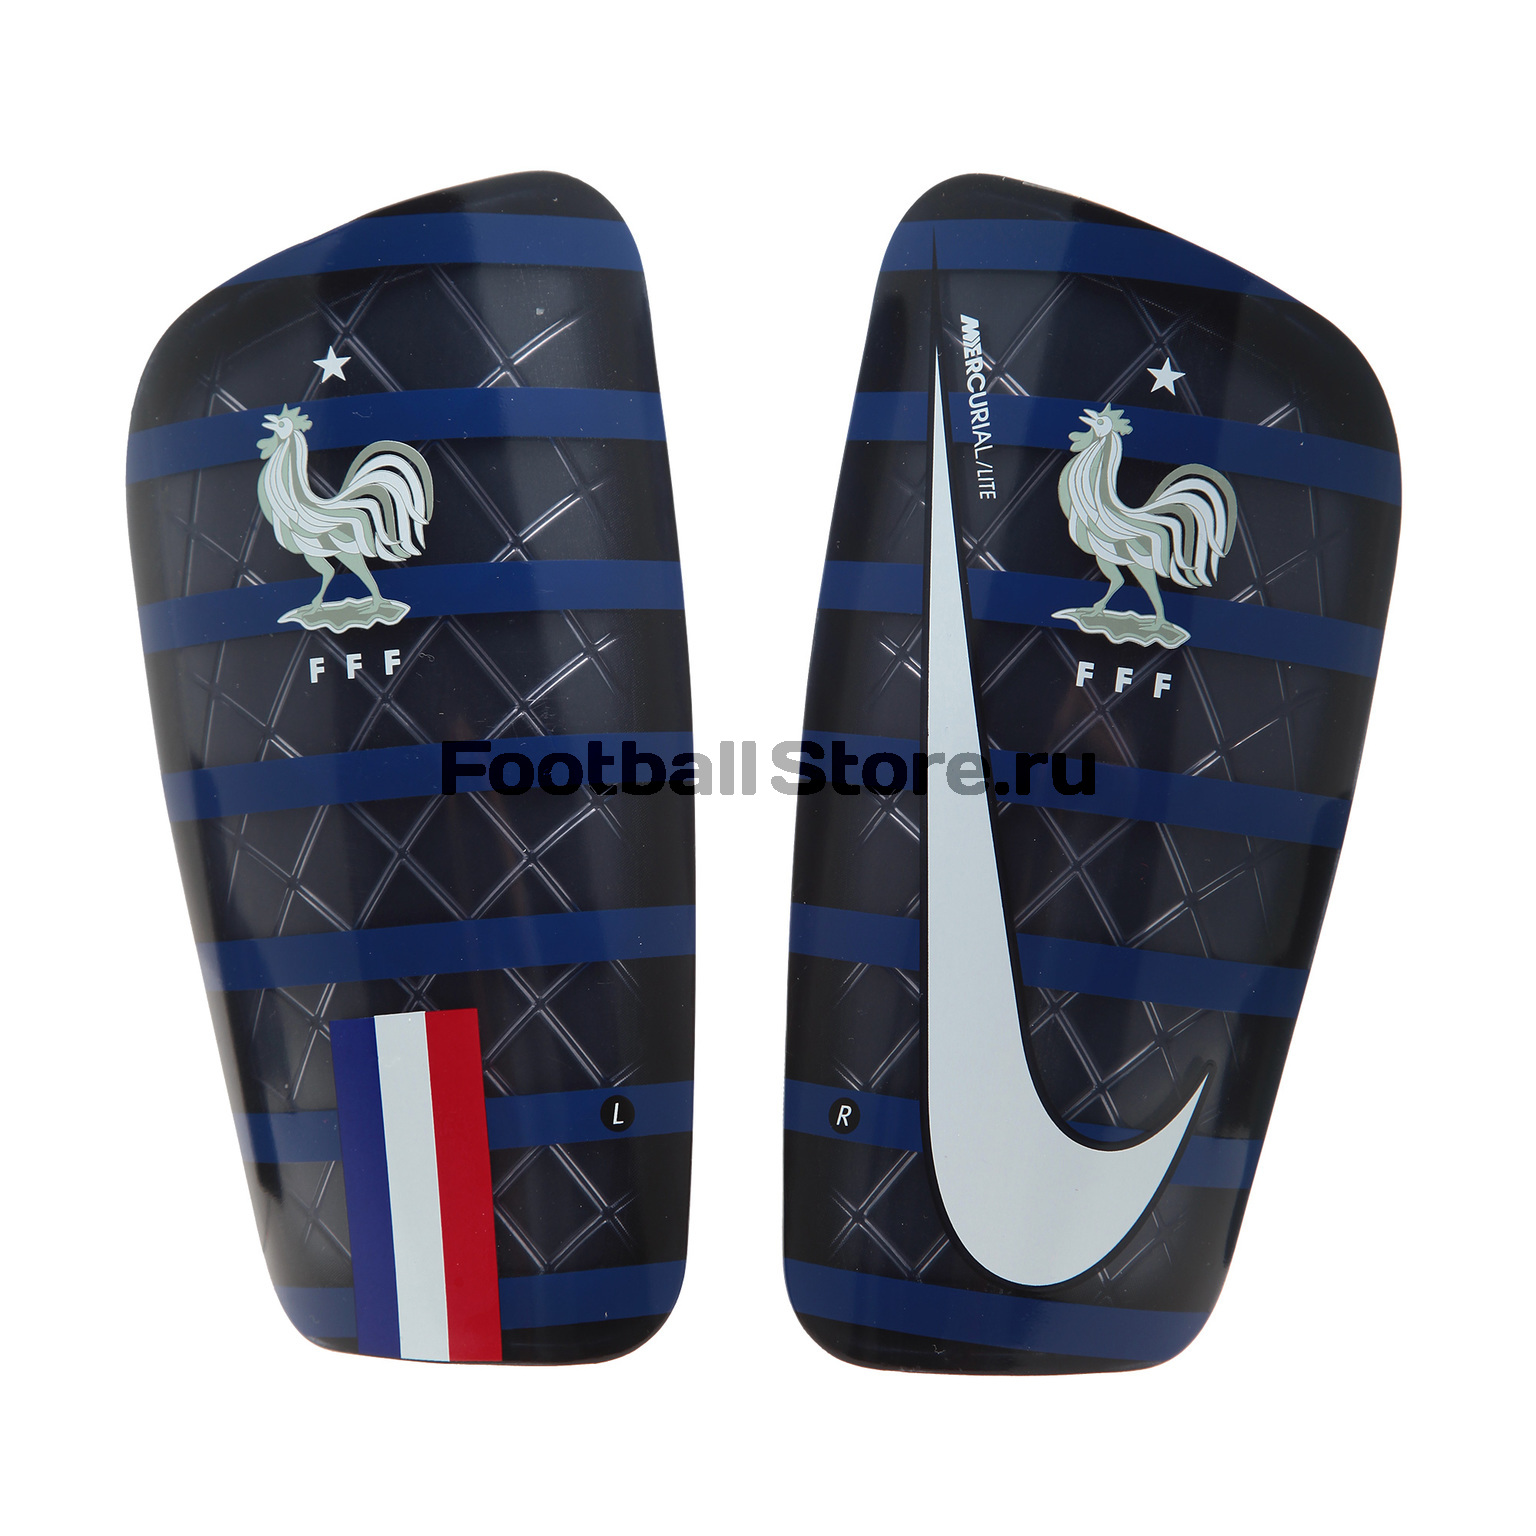 Щитки Nike Mercurial сборной Франции SP2125-451 nike nike mercurial lite